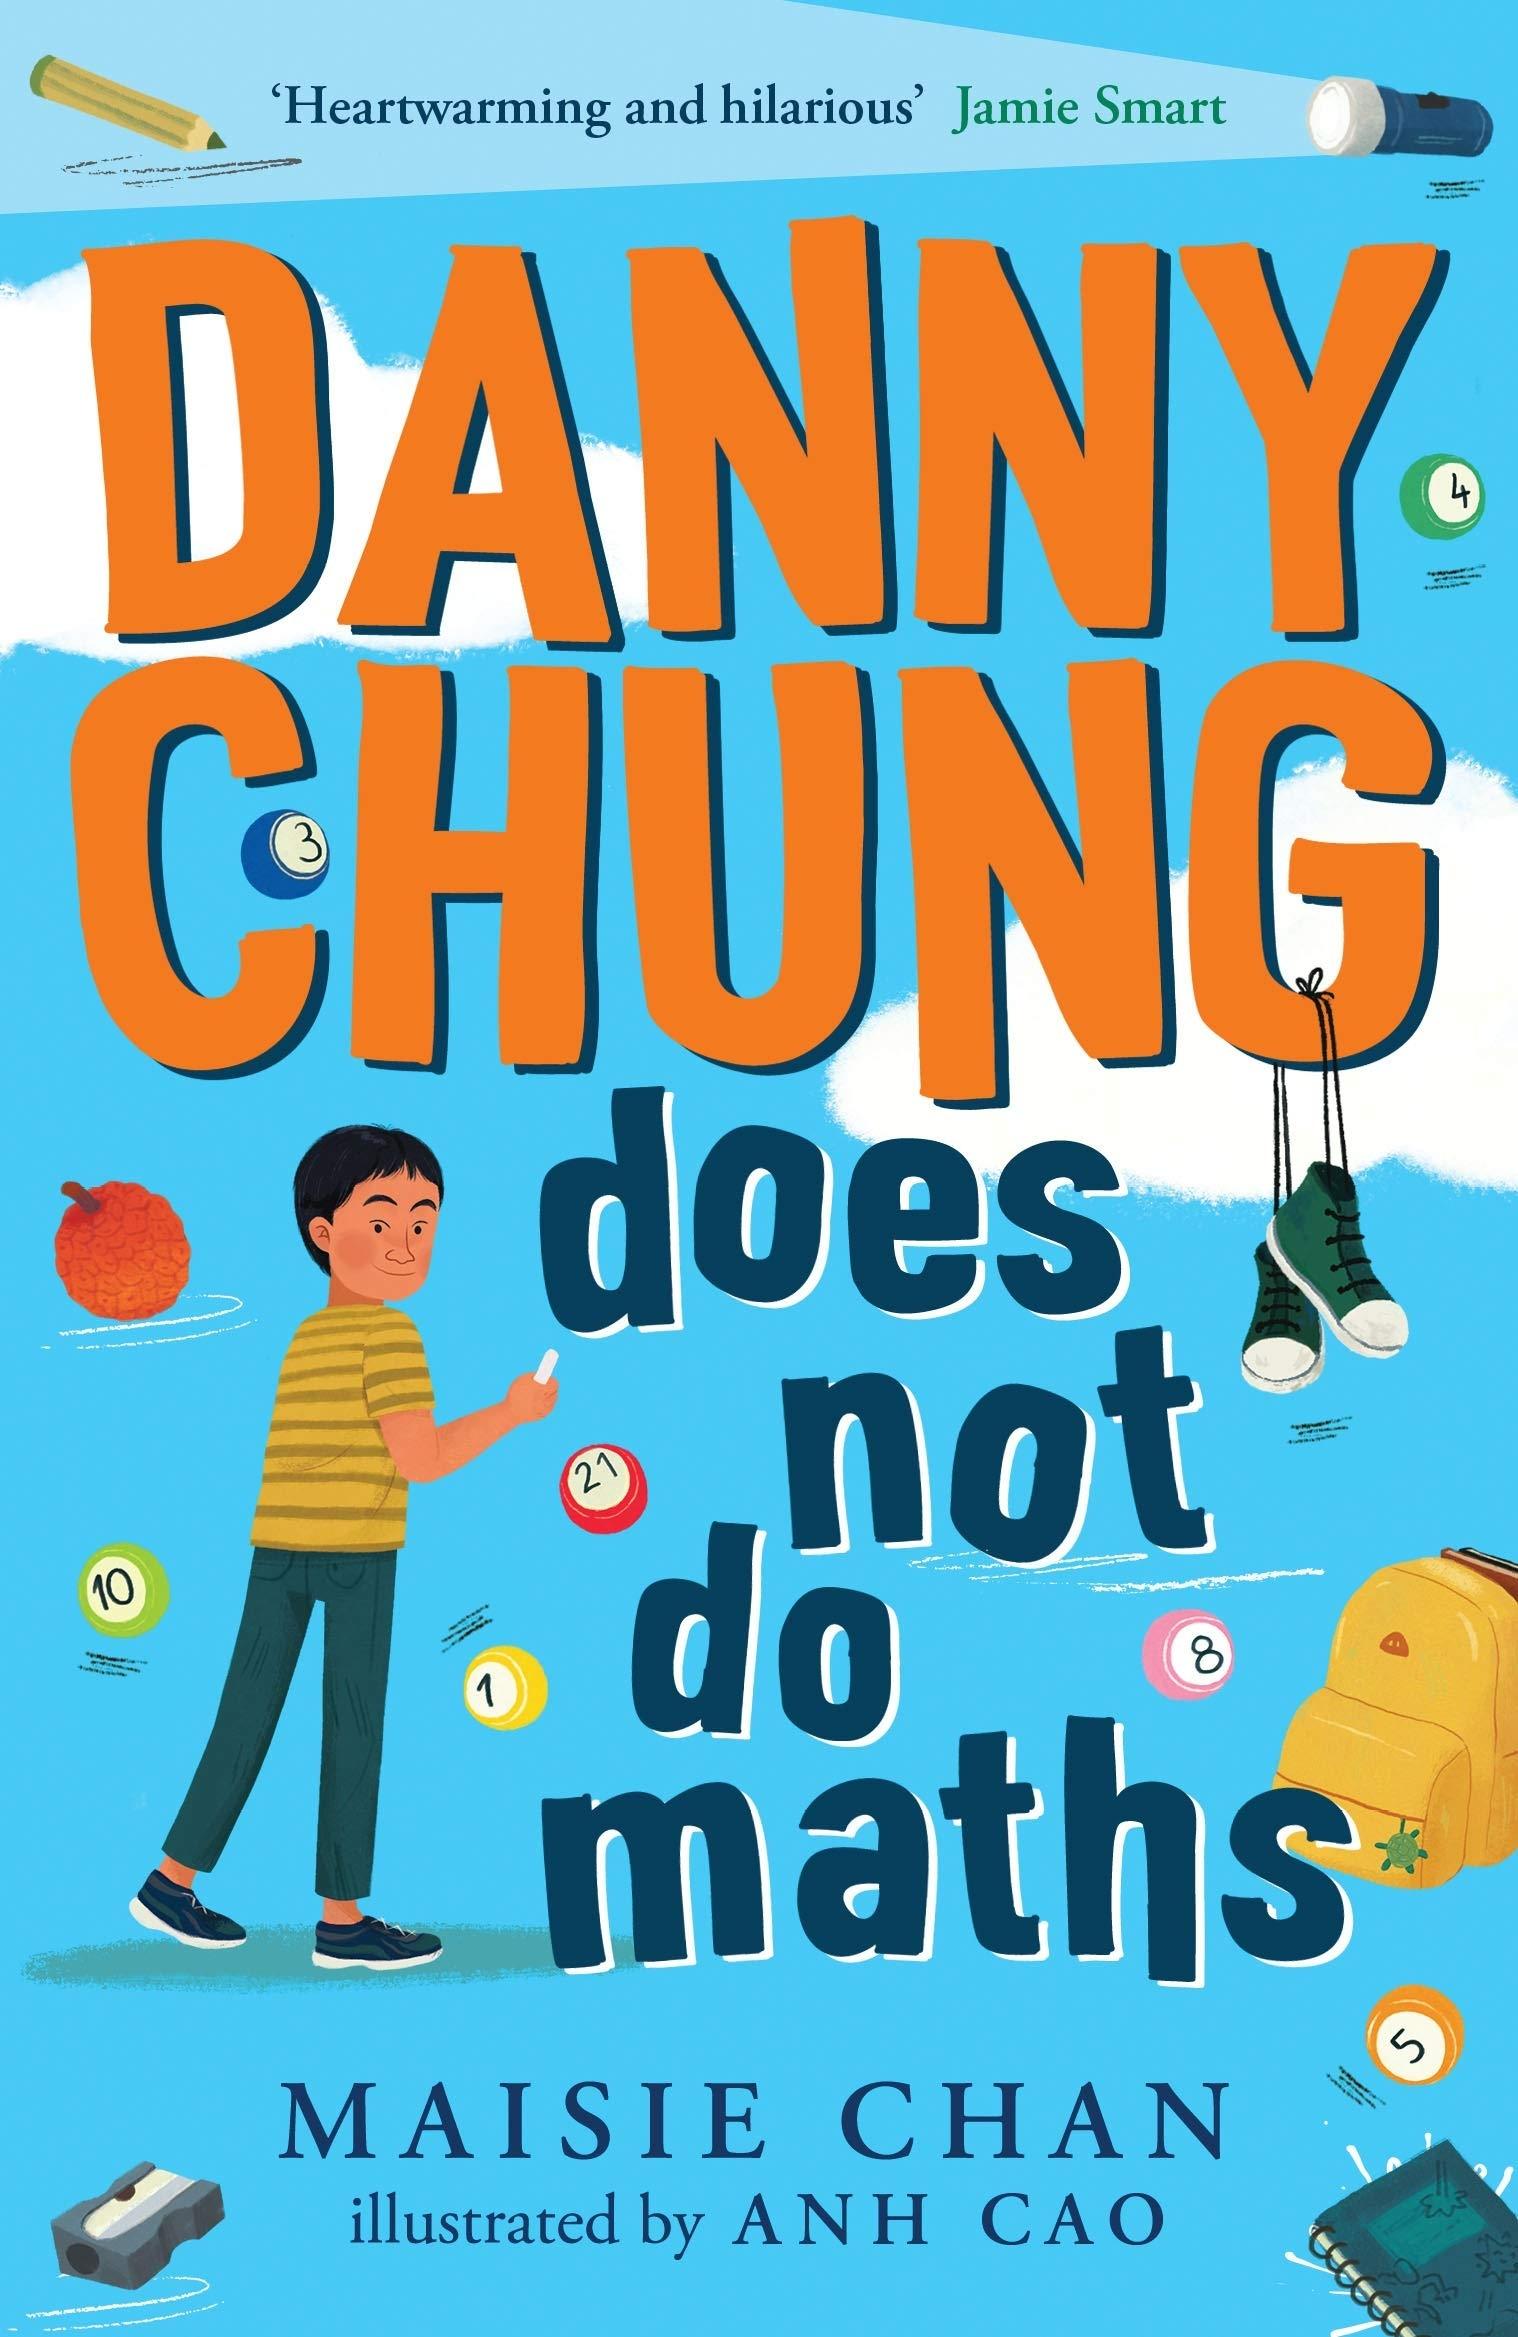 DannyChung